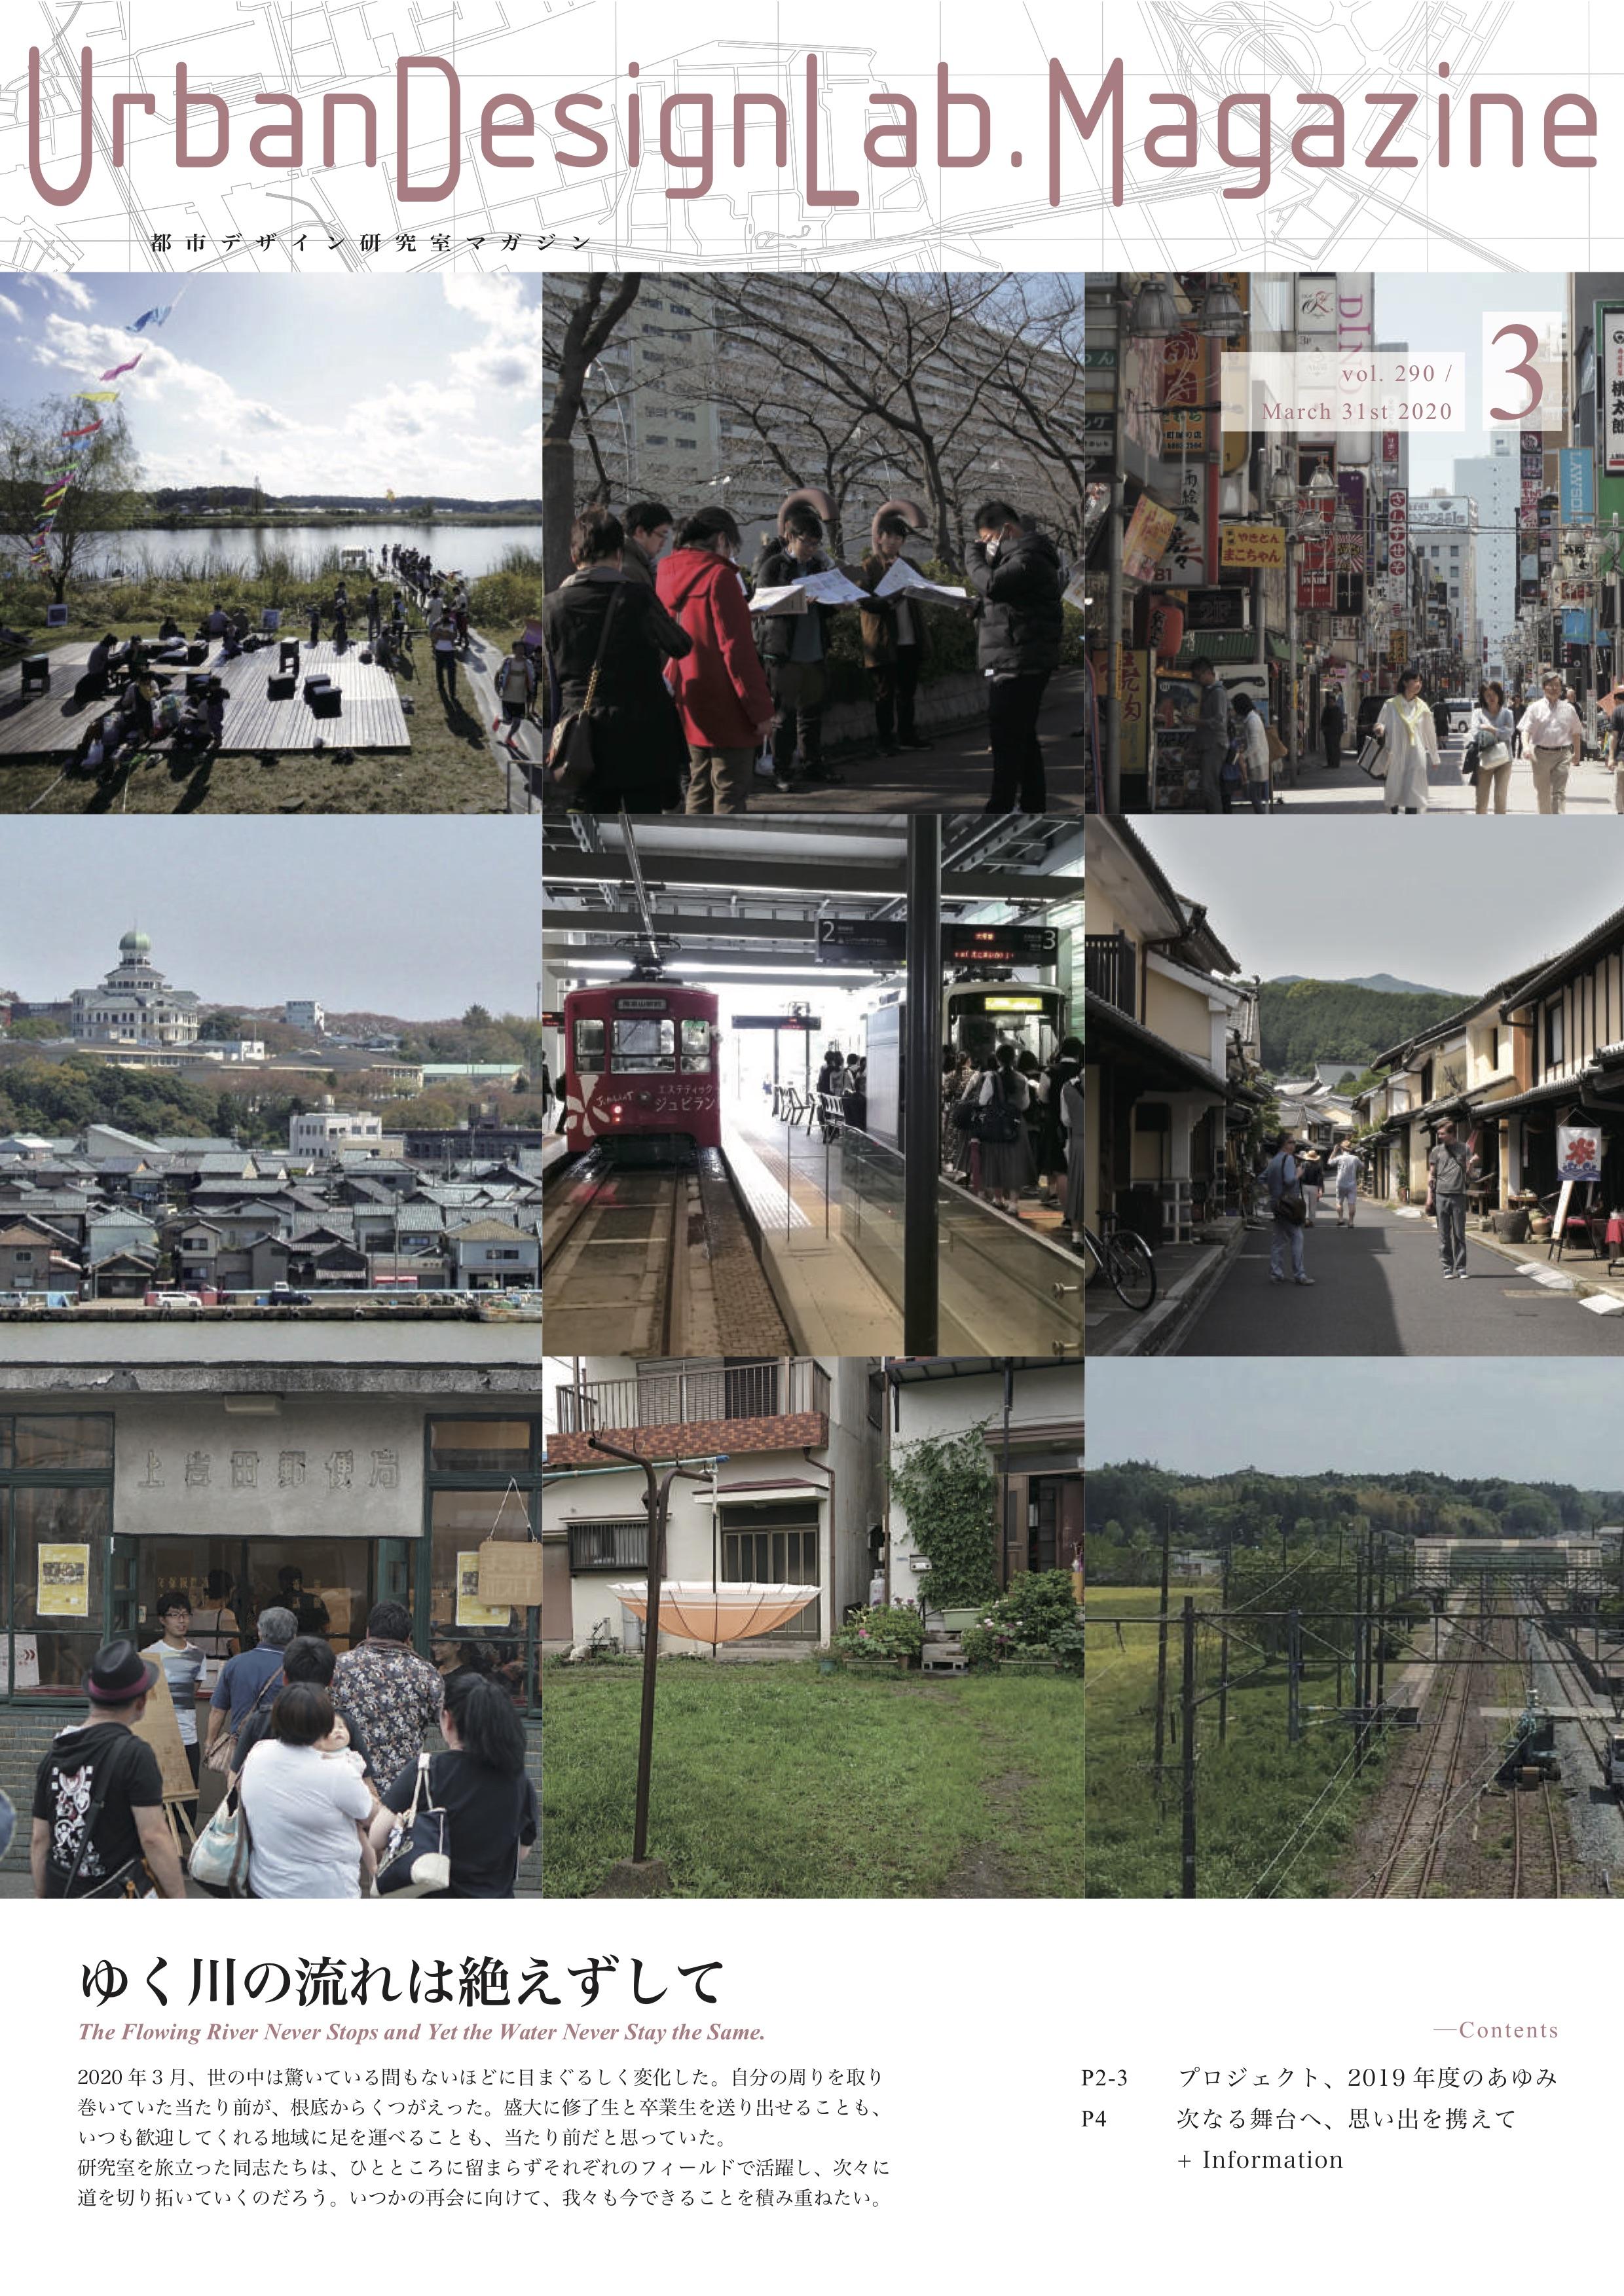 http://ud.t.u-tokyo.ac.jp/blog/_images/vol.290.jpg